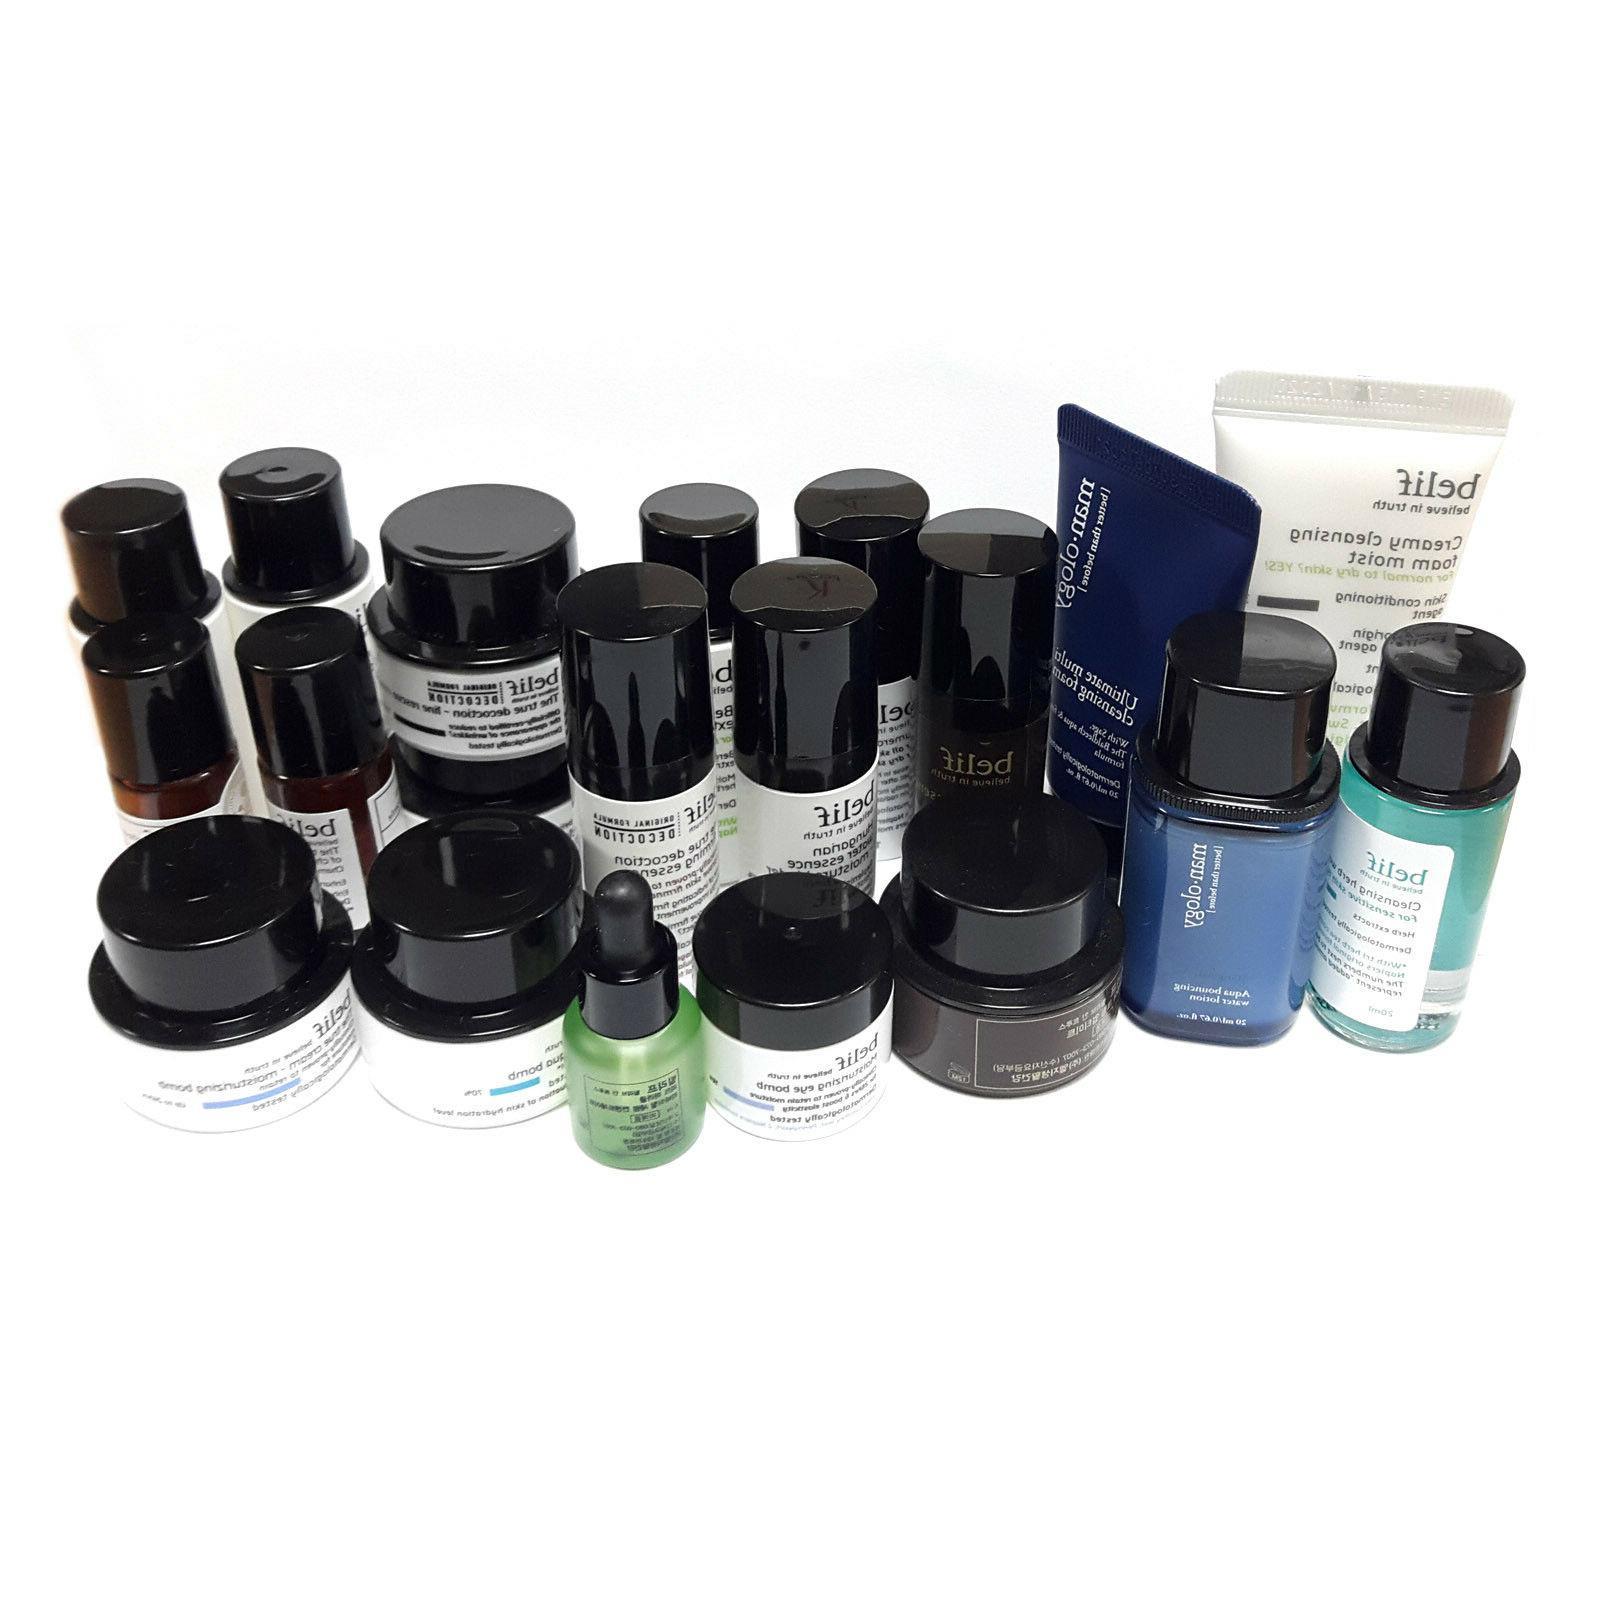 belif Skincare Deluxe samples - moisture,aqua bomb, serum, e